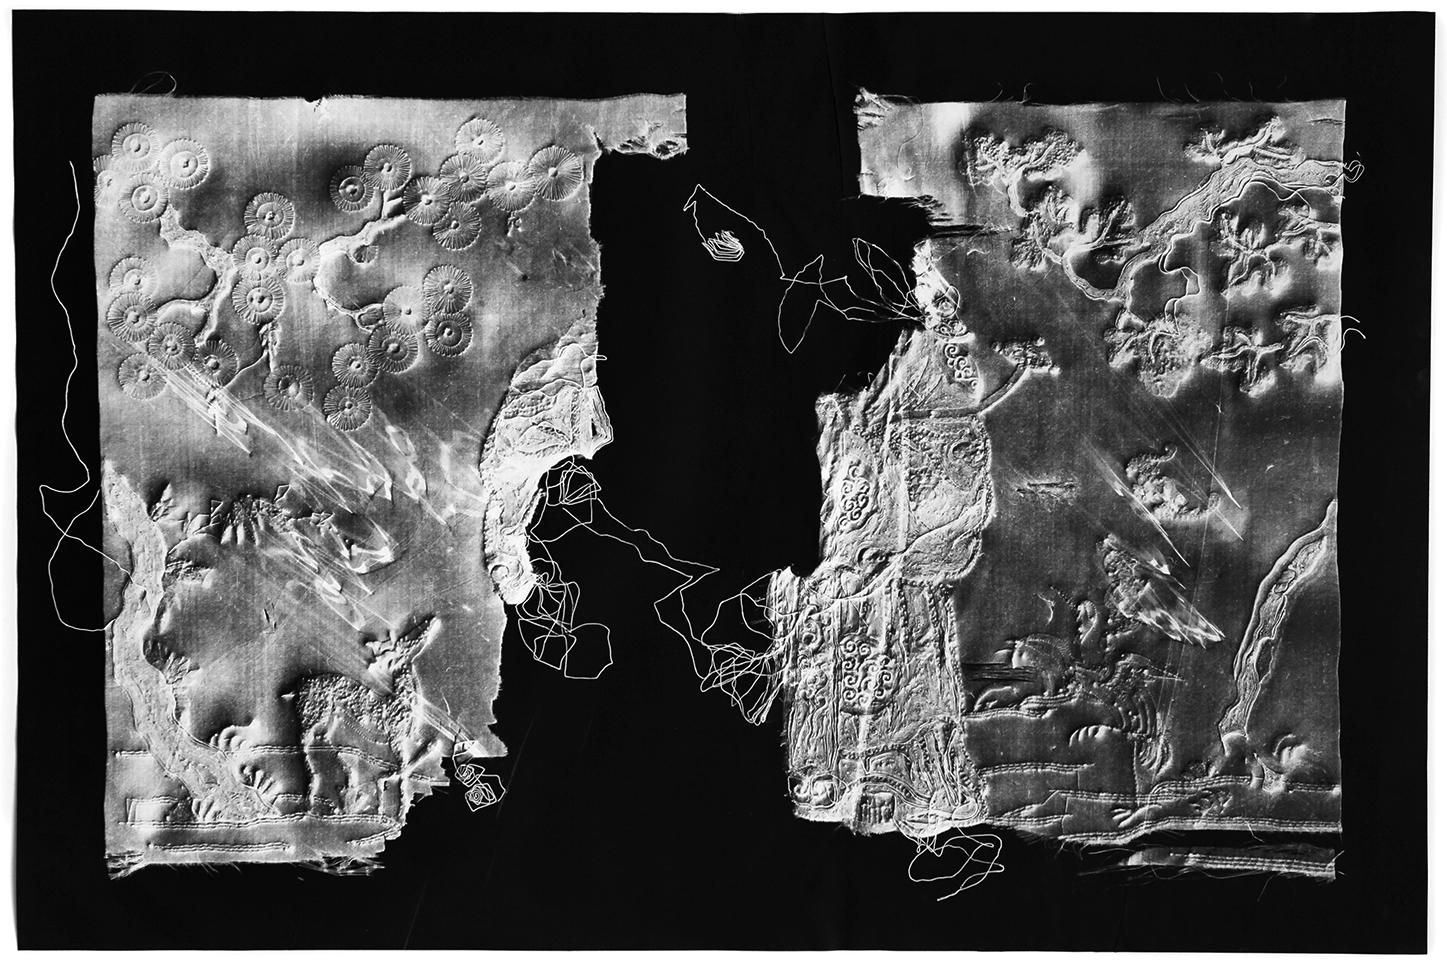 KLEA MCKENNA  Artifact #4,  2017 Photographic relief. Unique photogram on gelatin silver fiber paper. 26 x 39 inches